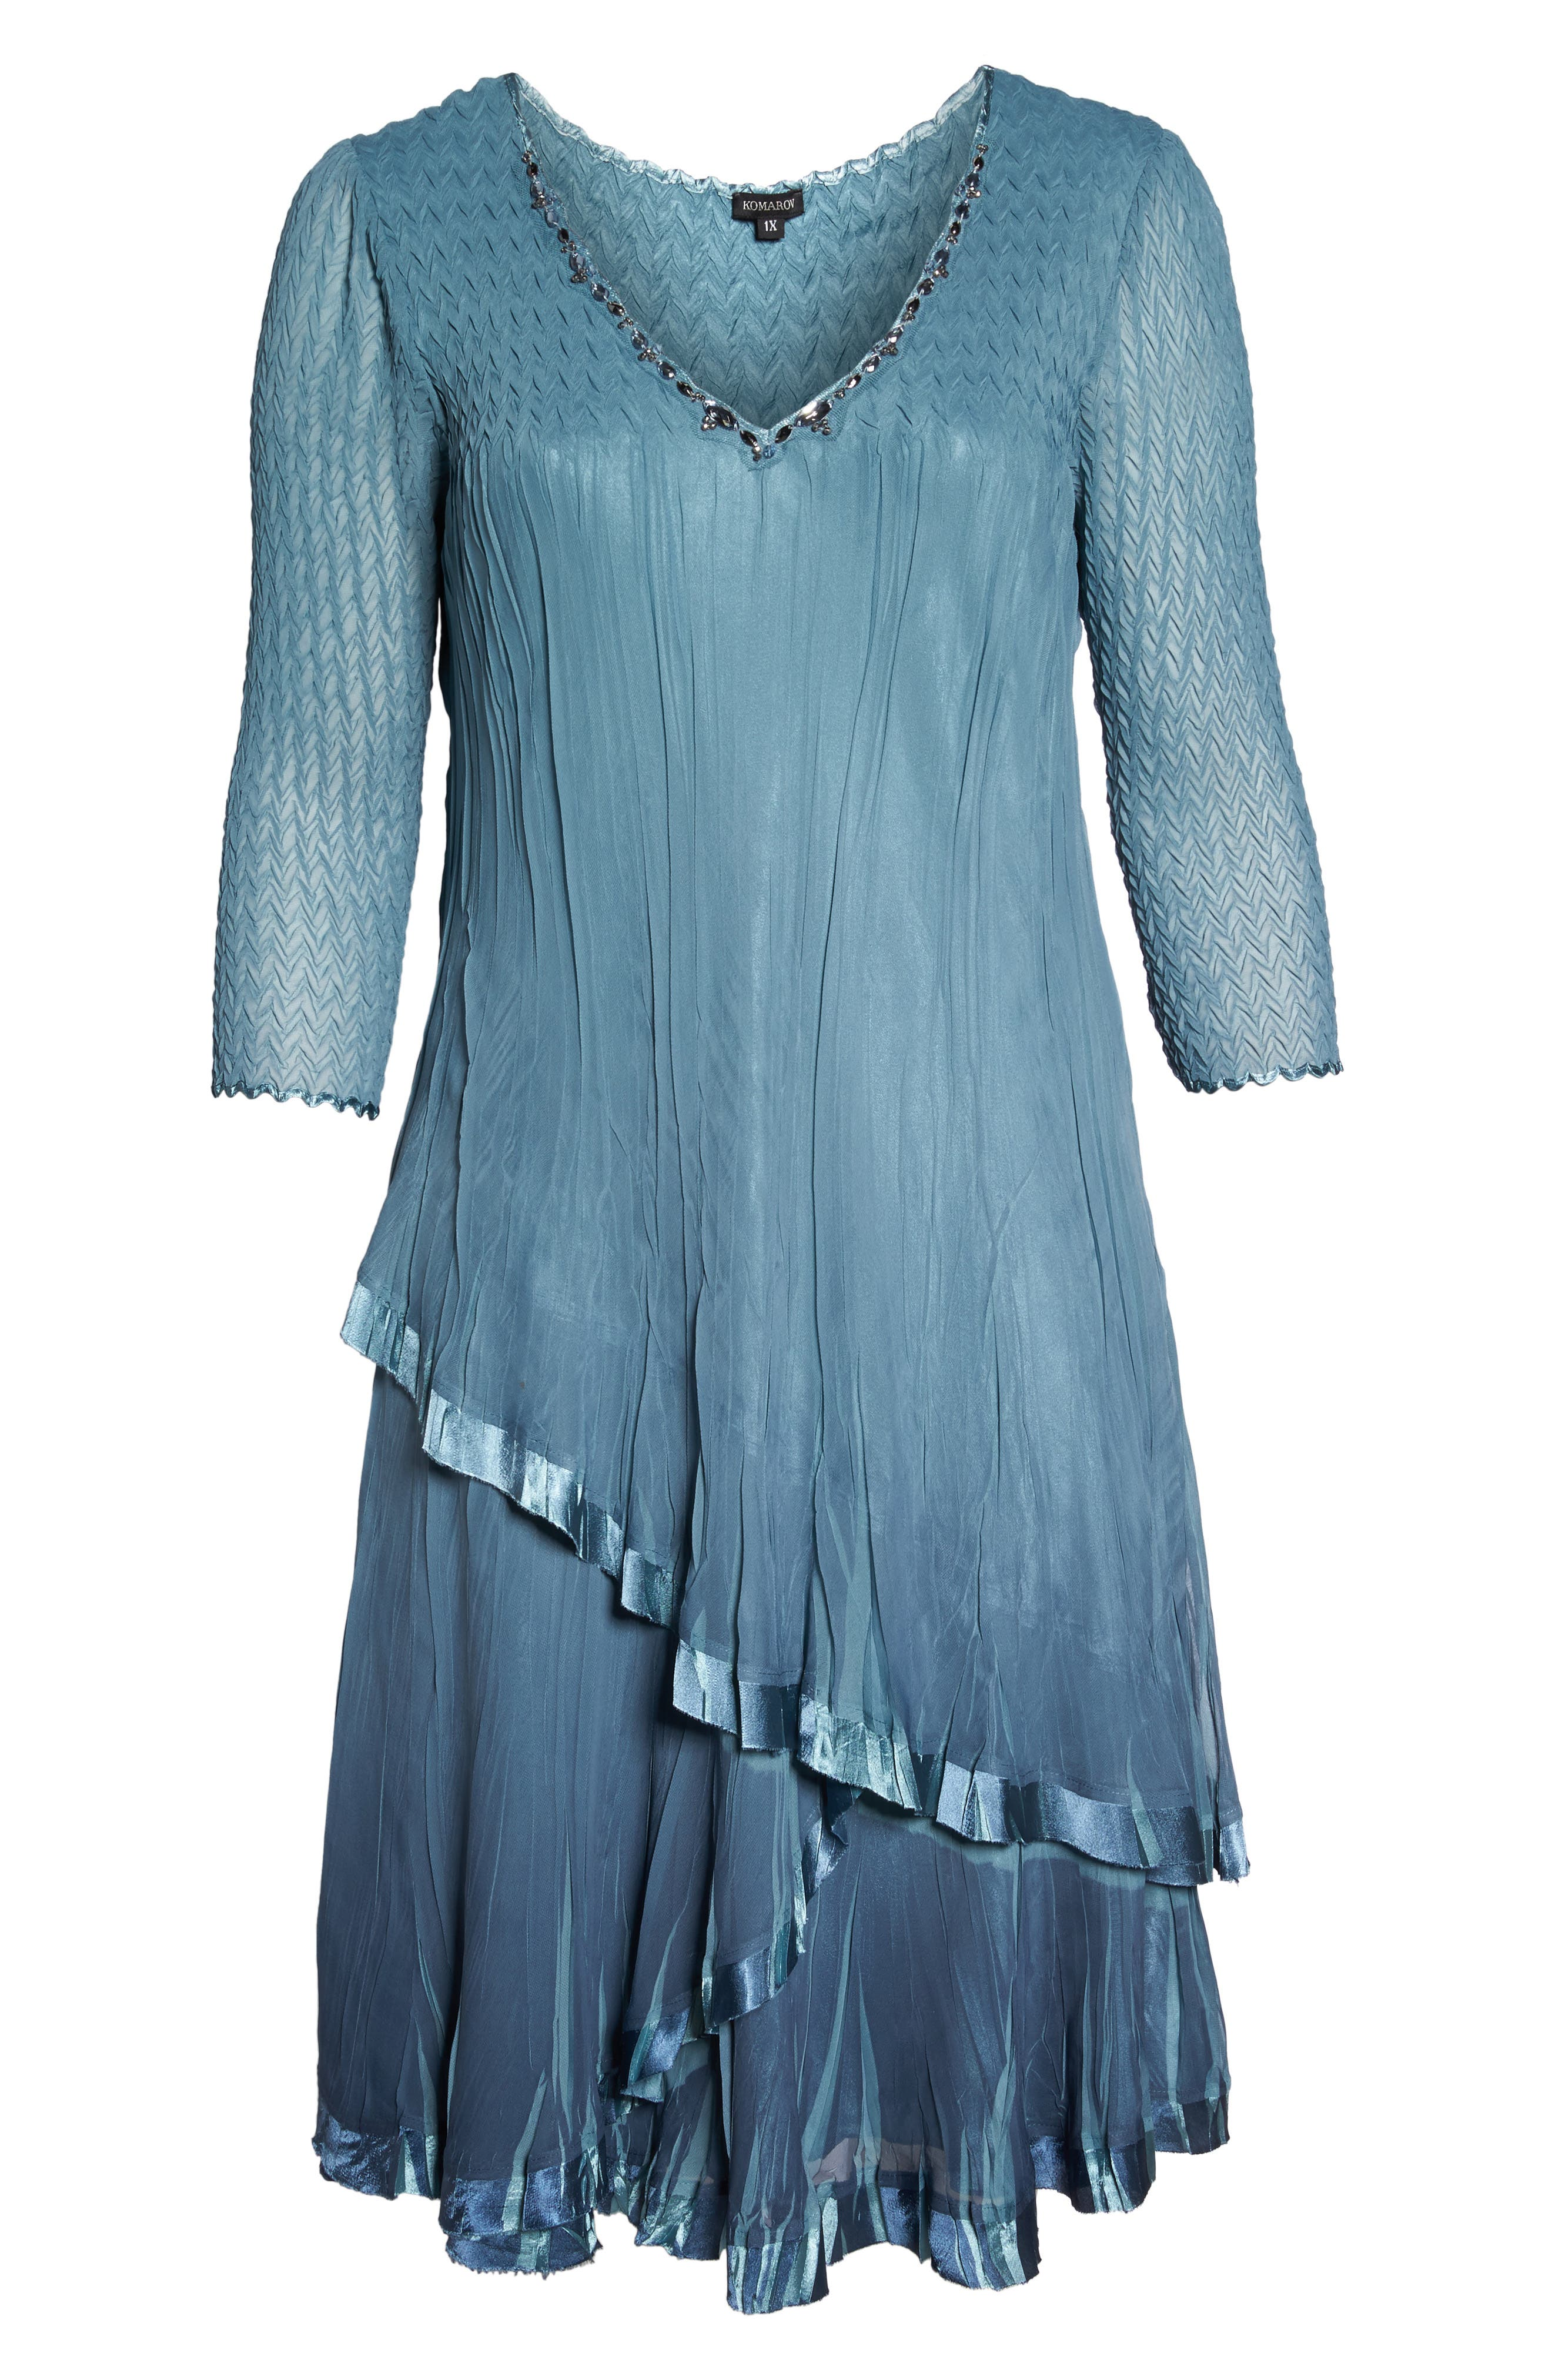 KOMAROV,                             Bead Trim Tiered Chiffon Dress,                             Alternate thumbnail 6, color,                             405